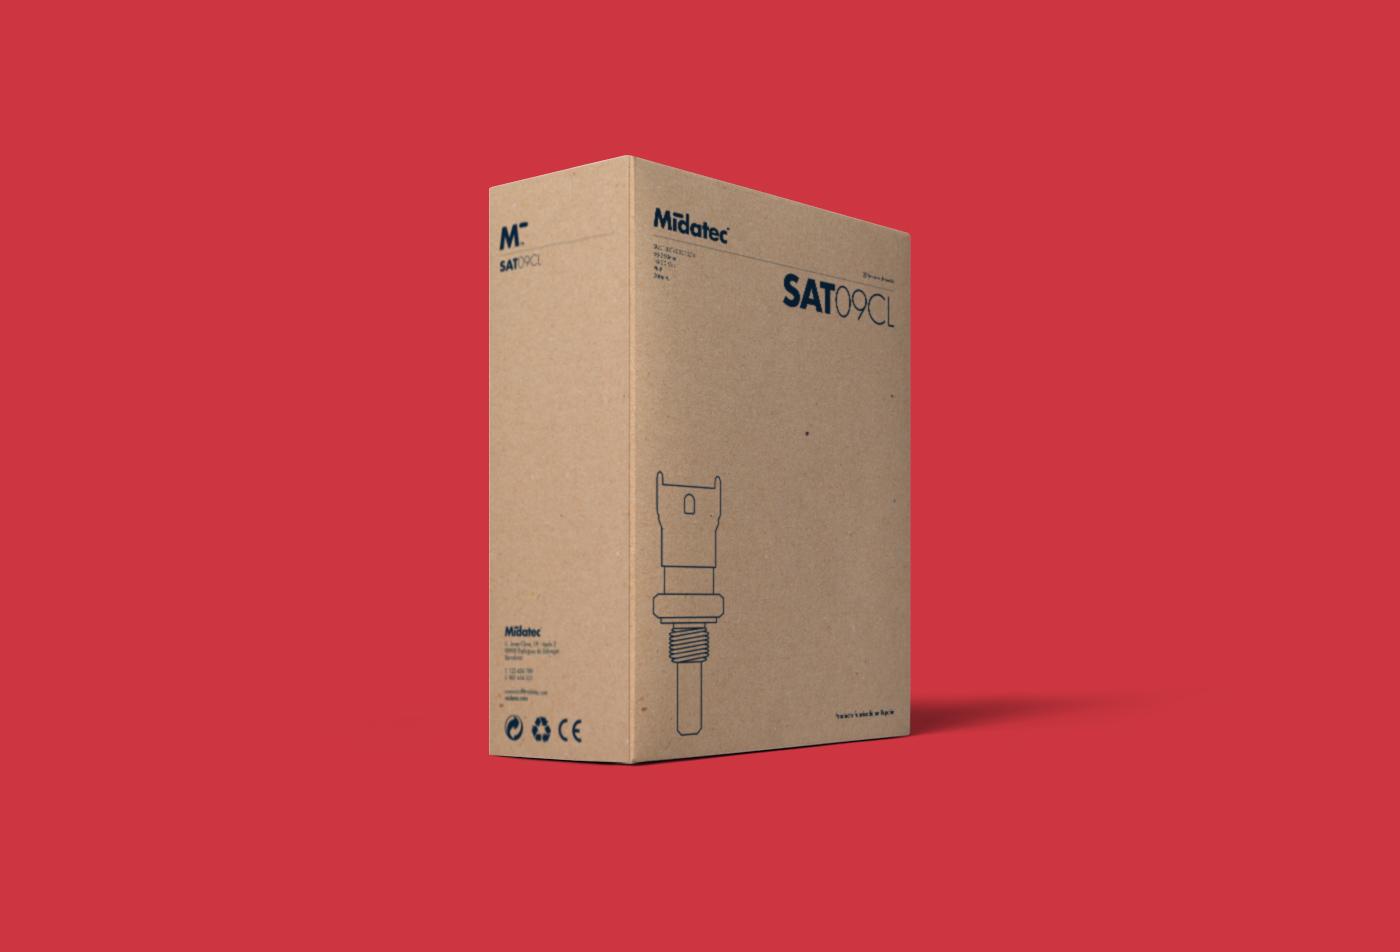 pixelarte-estudio-diseno-grafico-packaging-industrial-para-Midatec